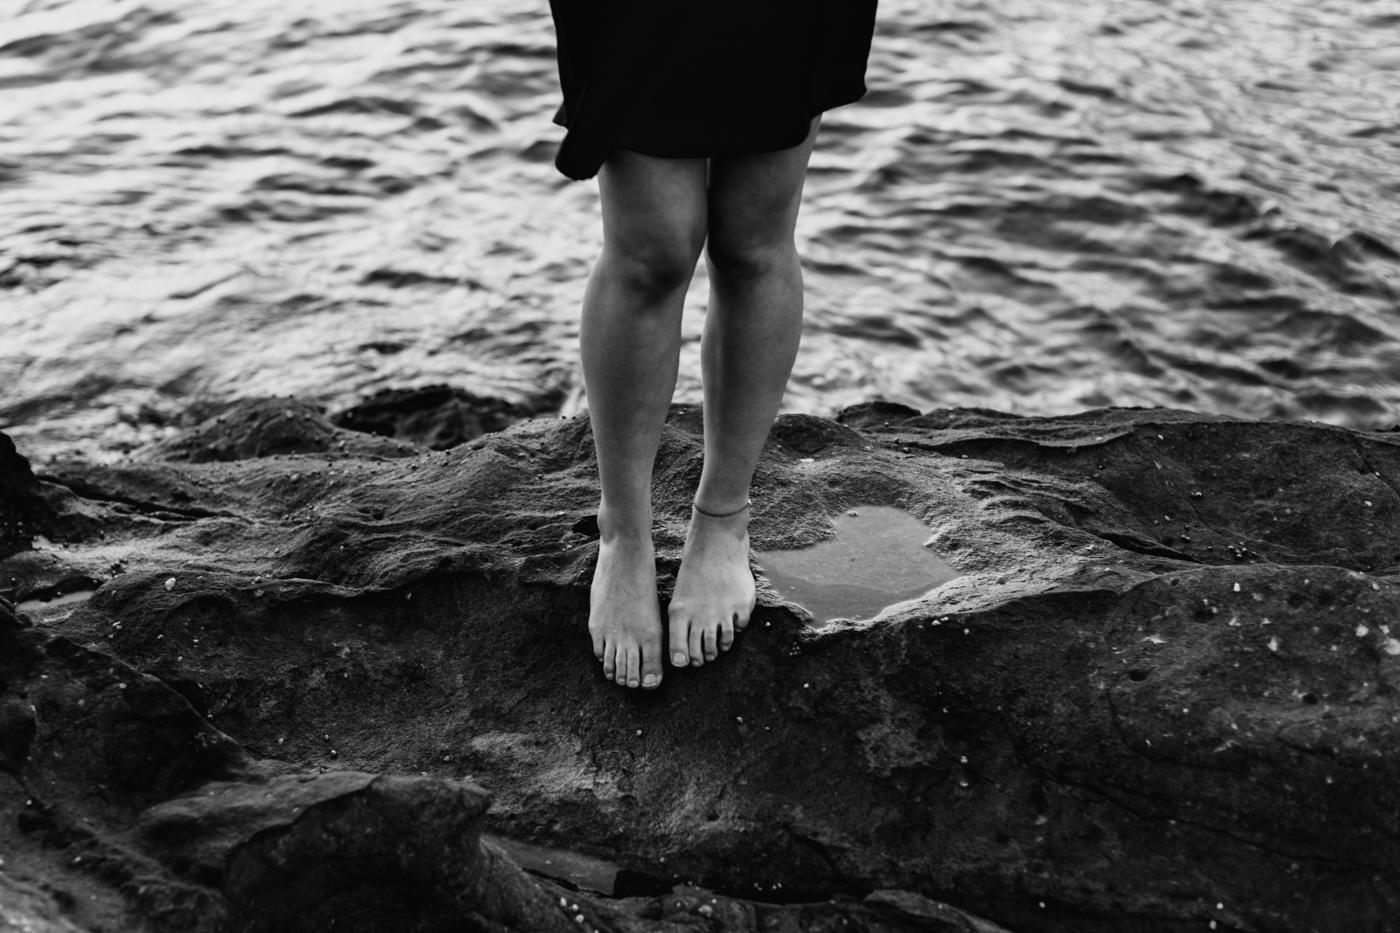 James & Caitie Engagement - Watsons Bay - Samantha Heather Photography-83.jpg